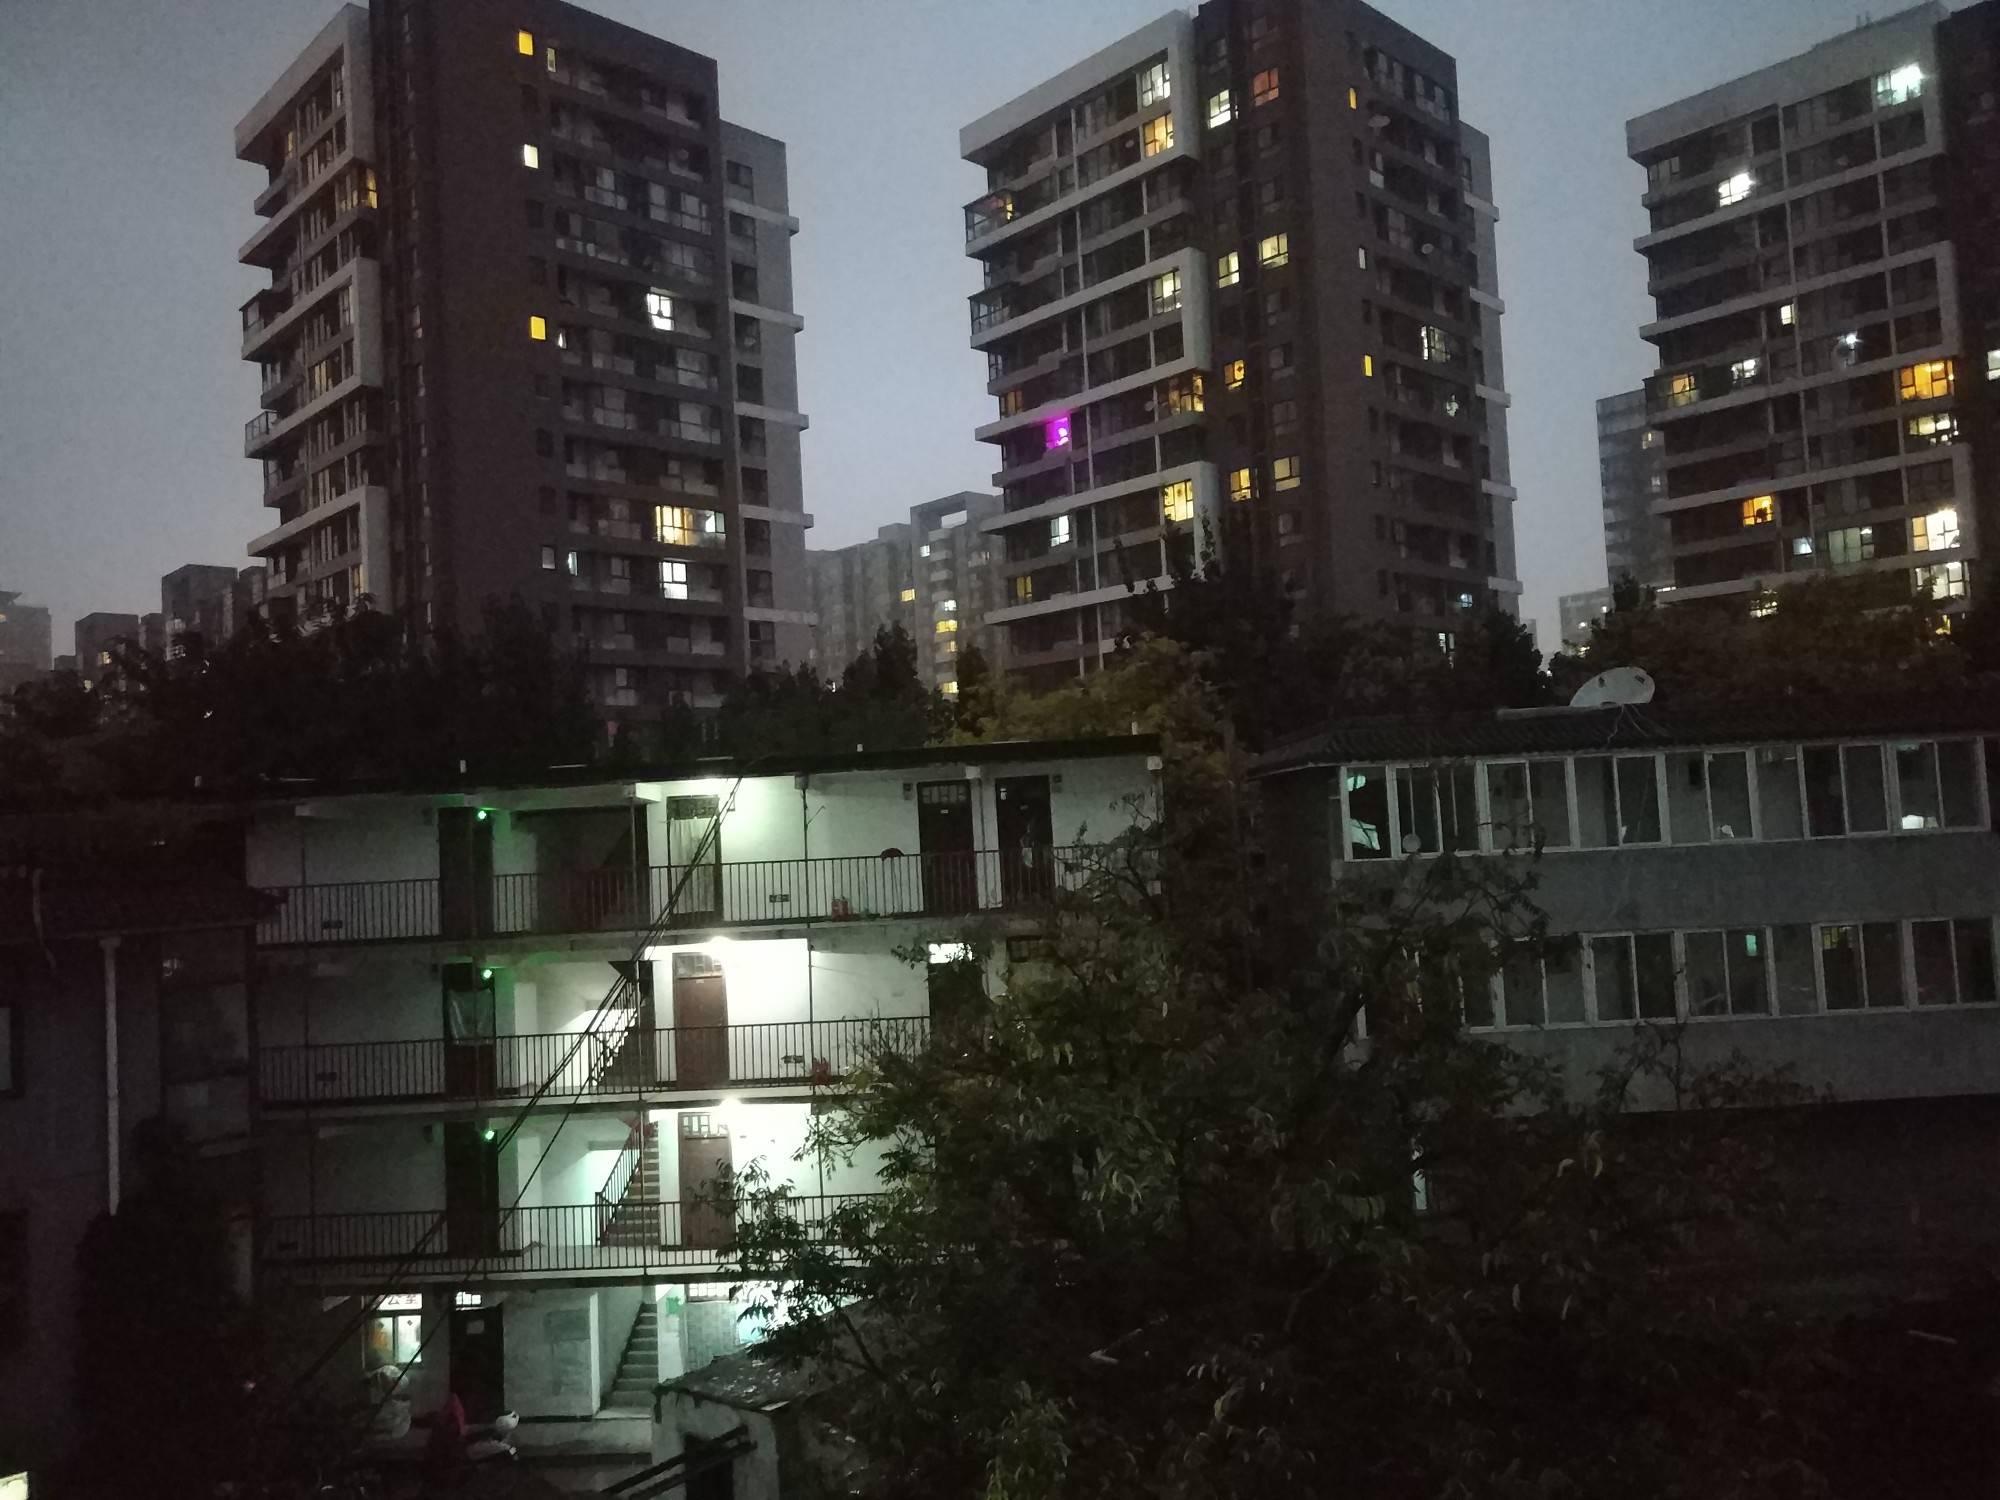 xiaomi mi5s camera sample Photo by Hao Ying 3